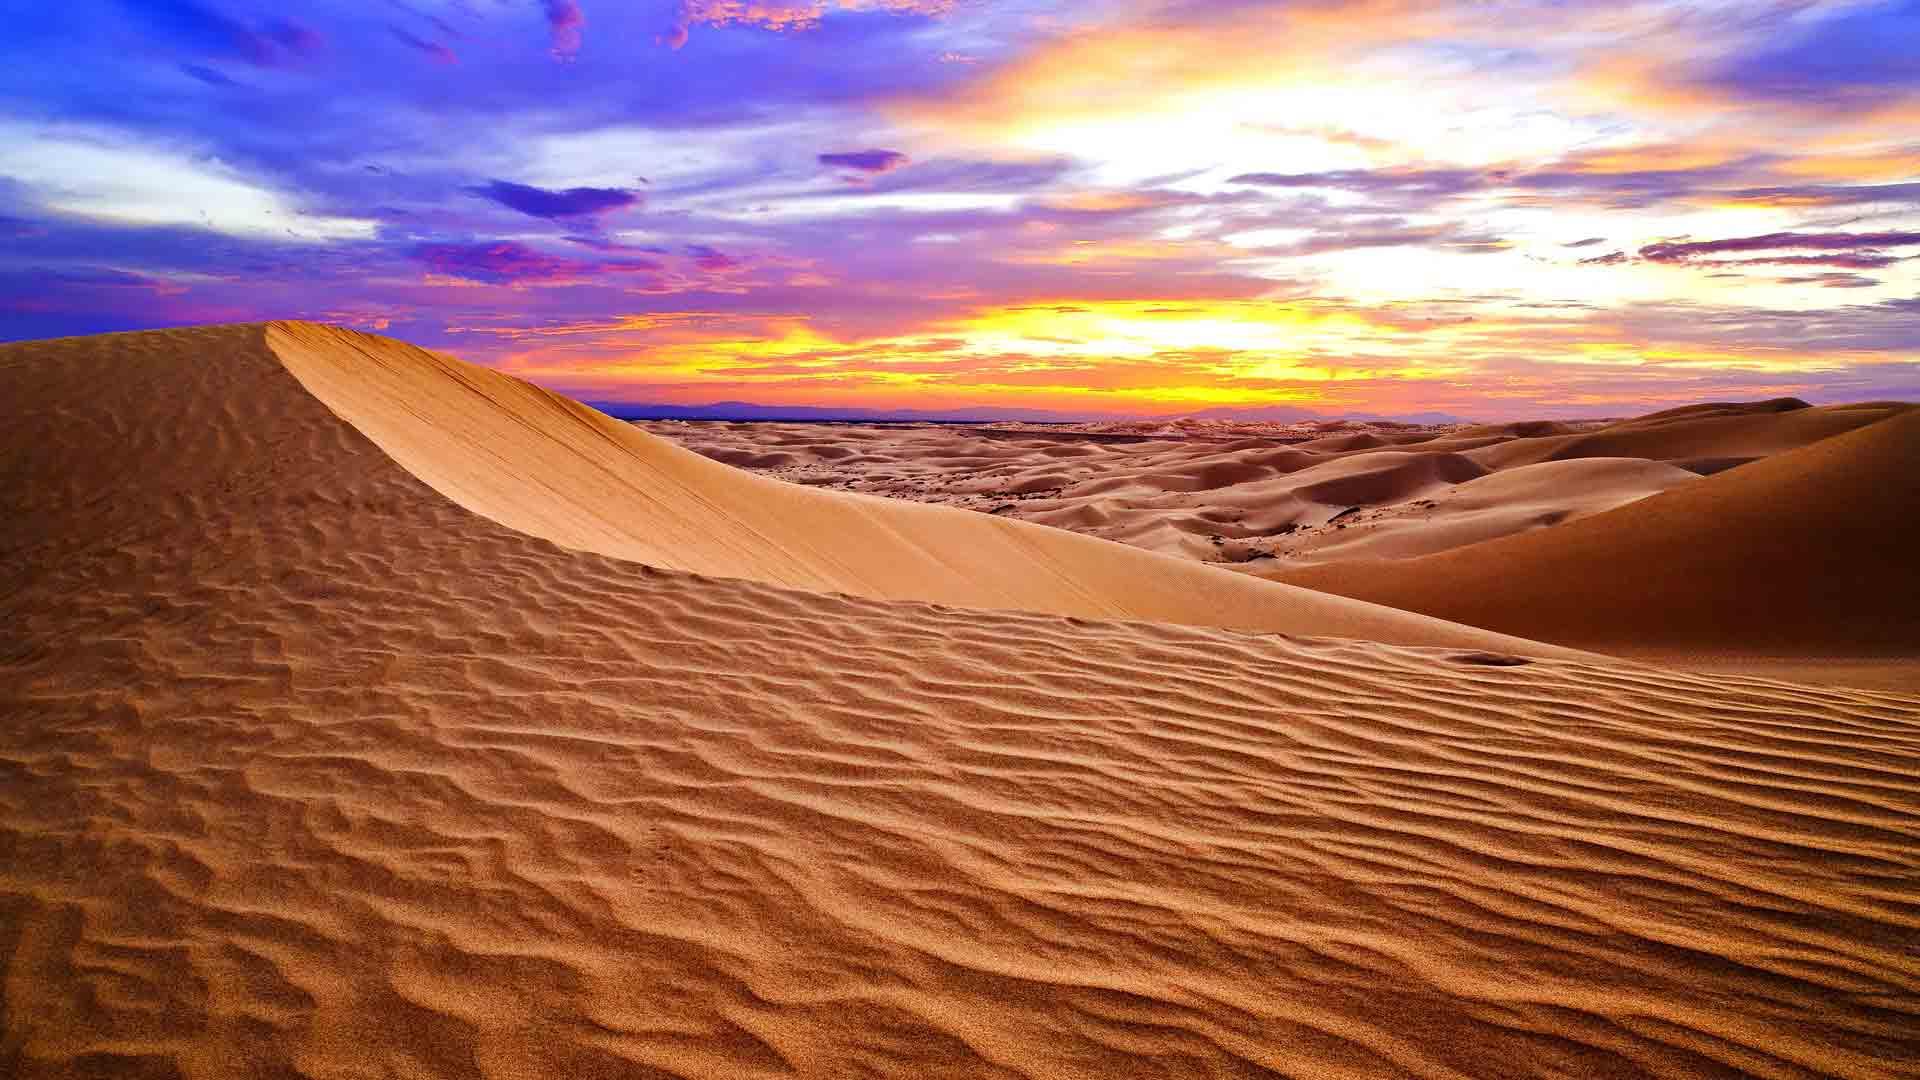 free-algeria-wallpaper_010301607_131111